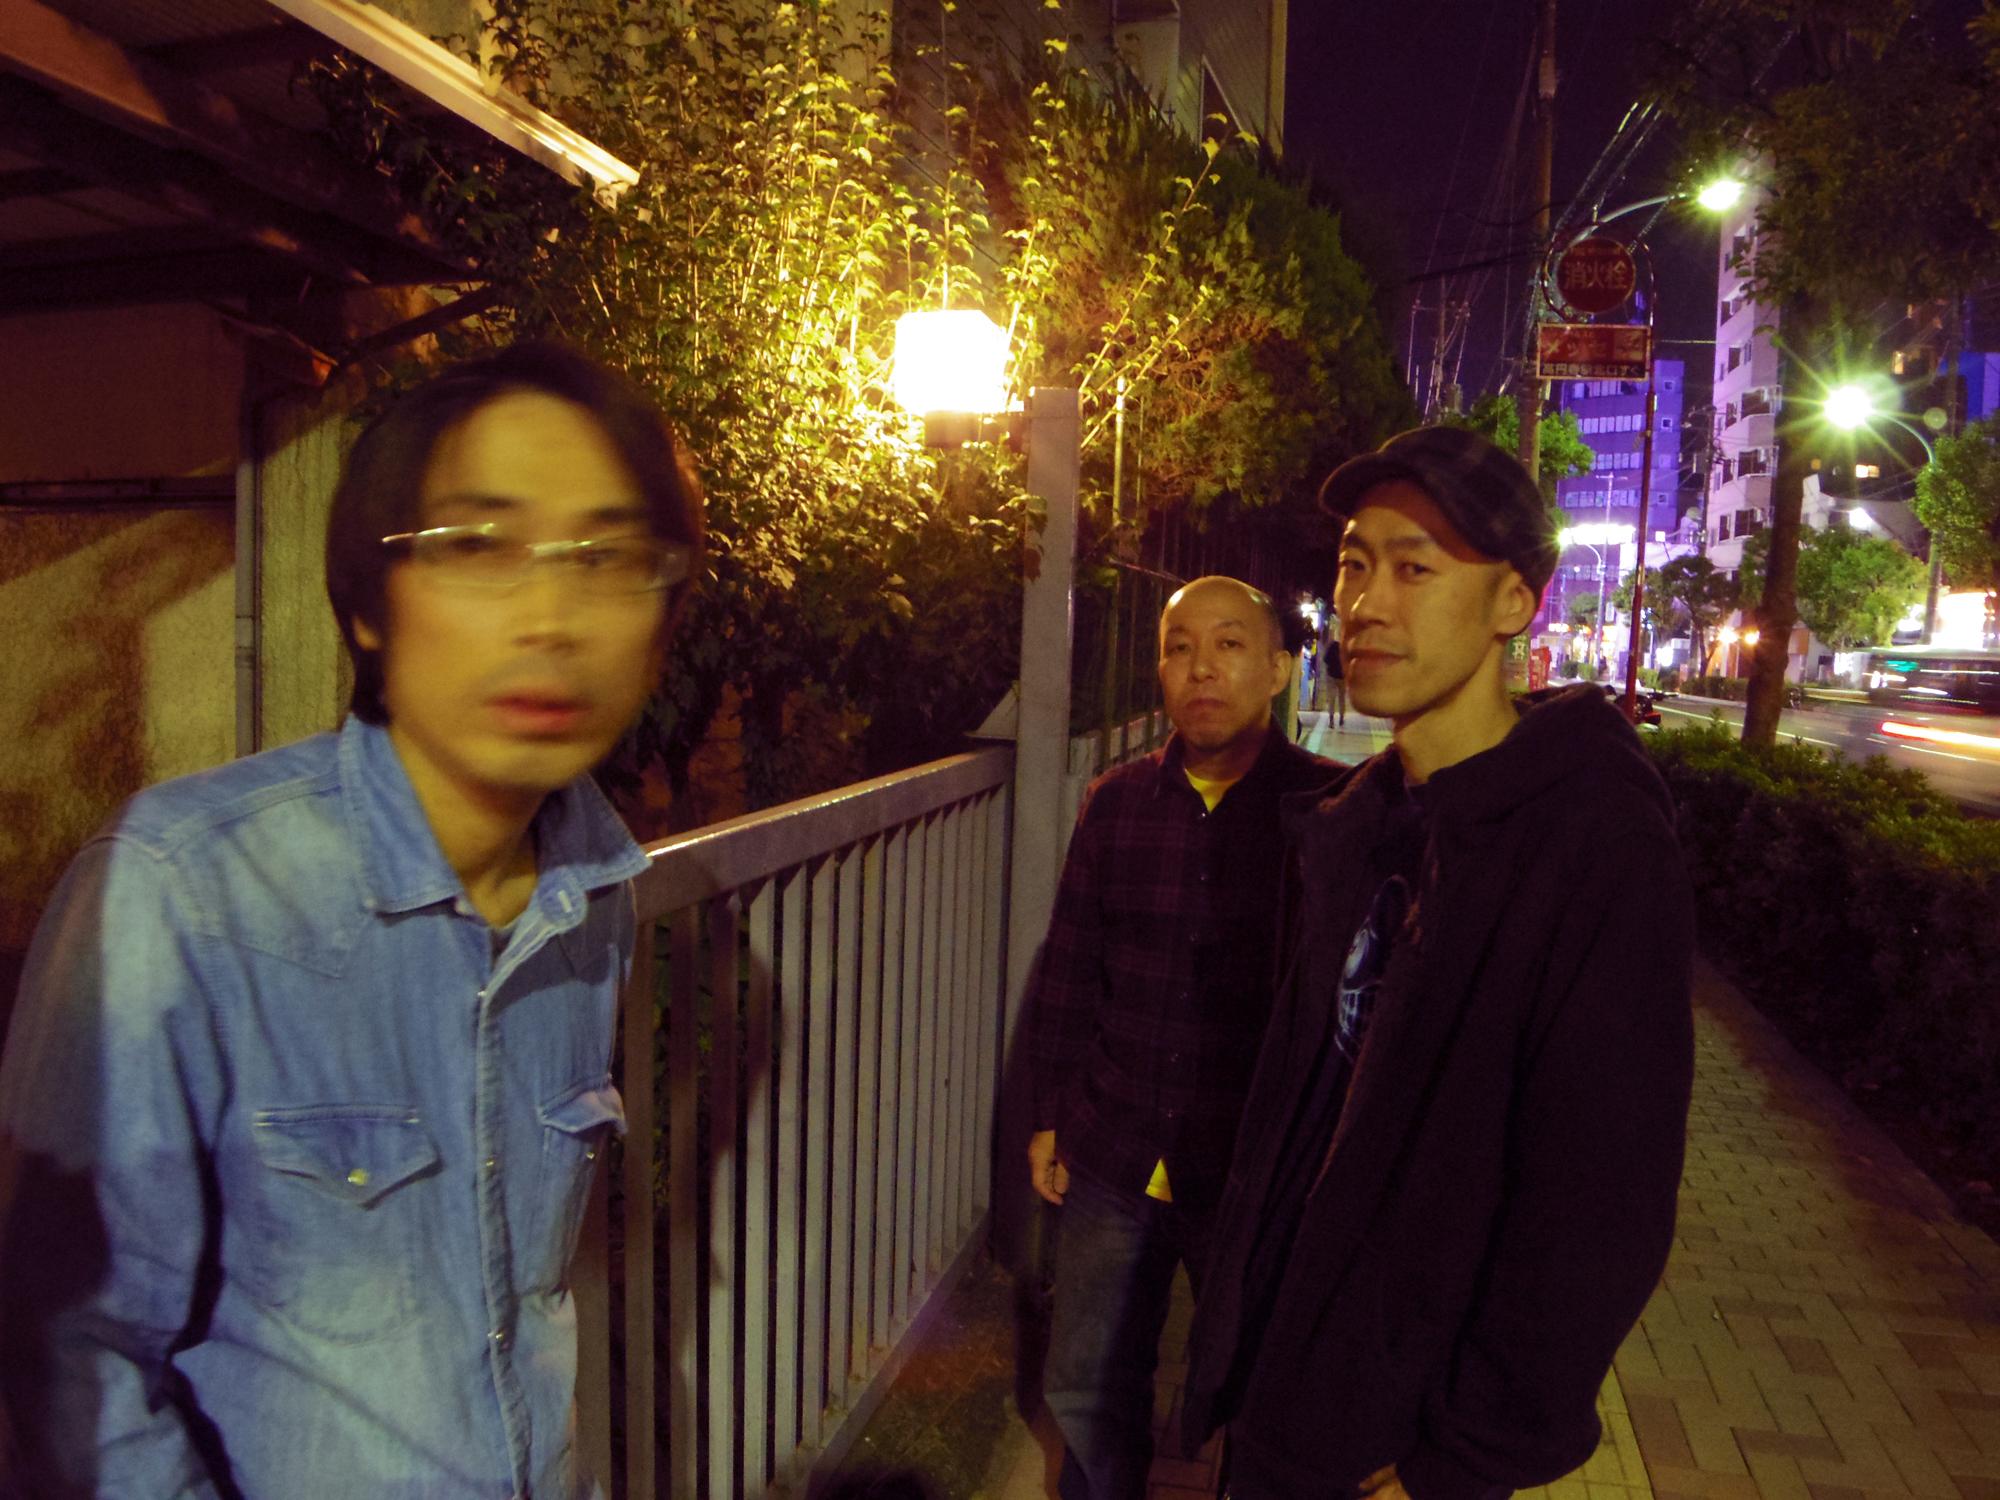 http://rose-records.jp/files/shaiganthi_a-sya.jpg